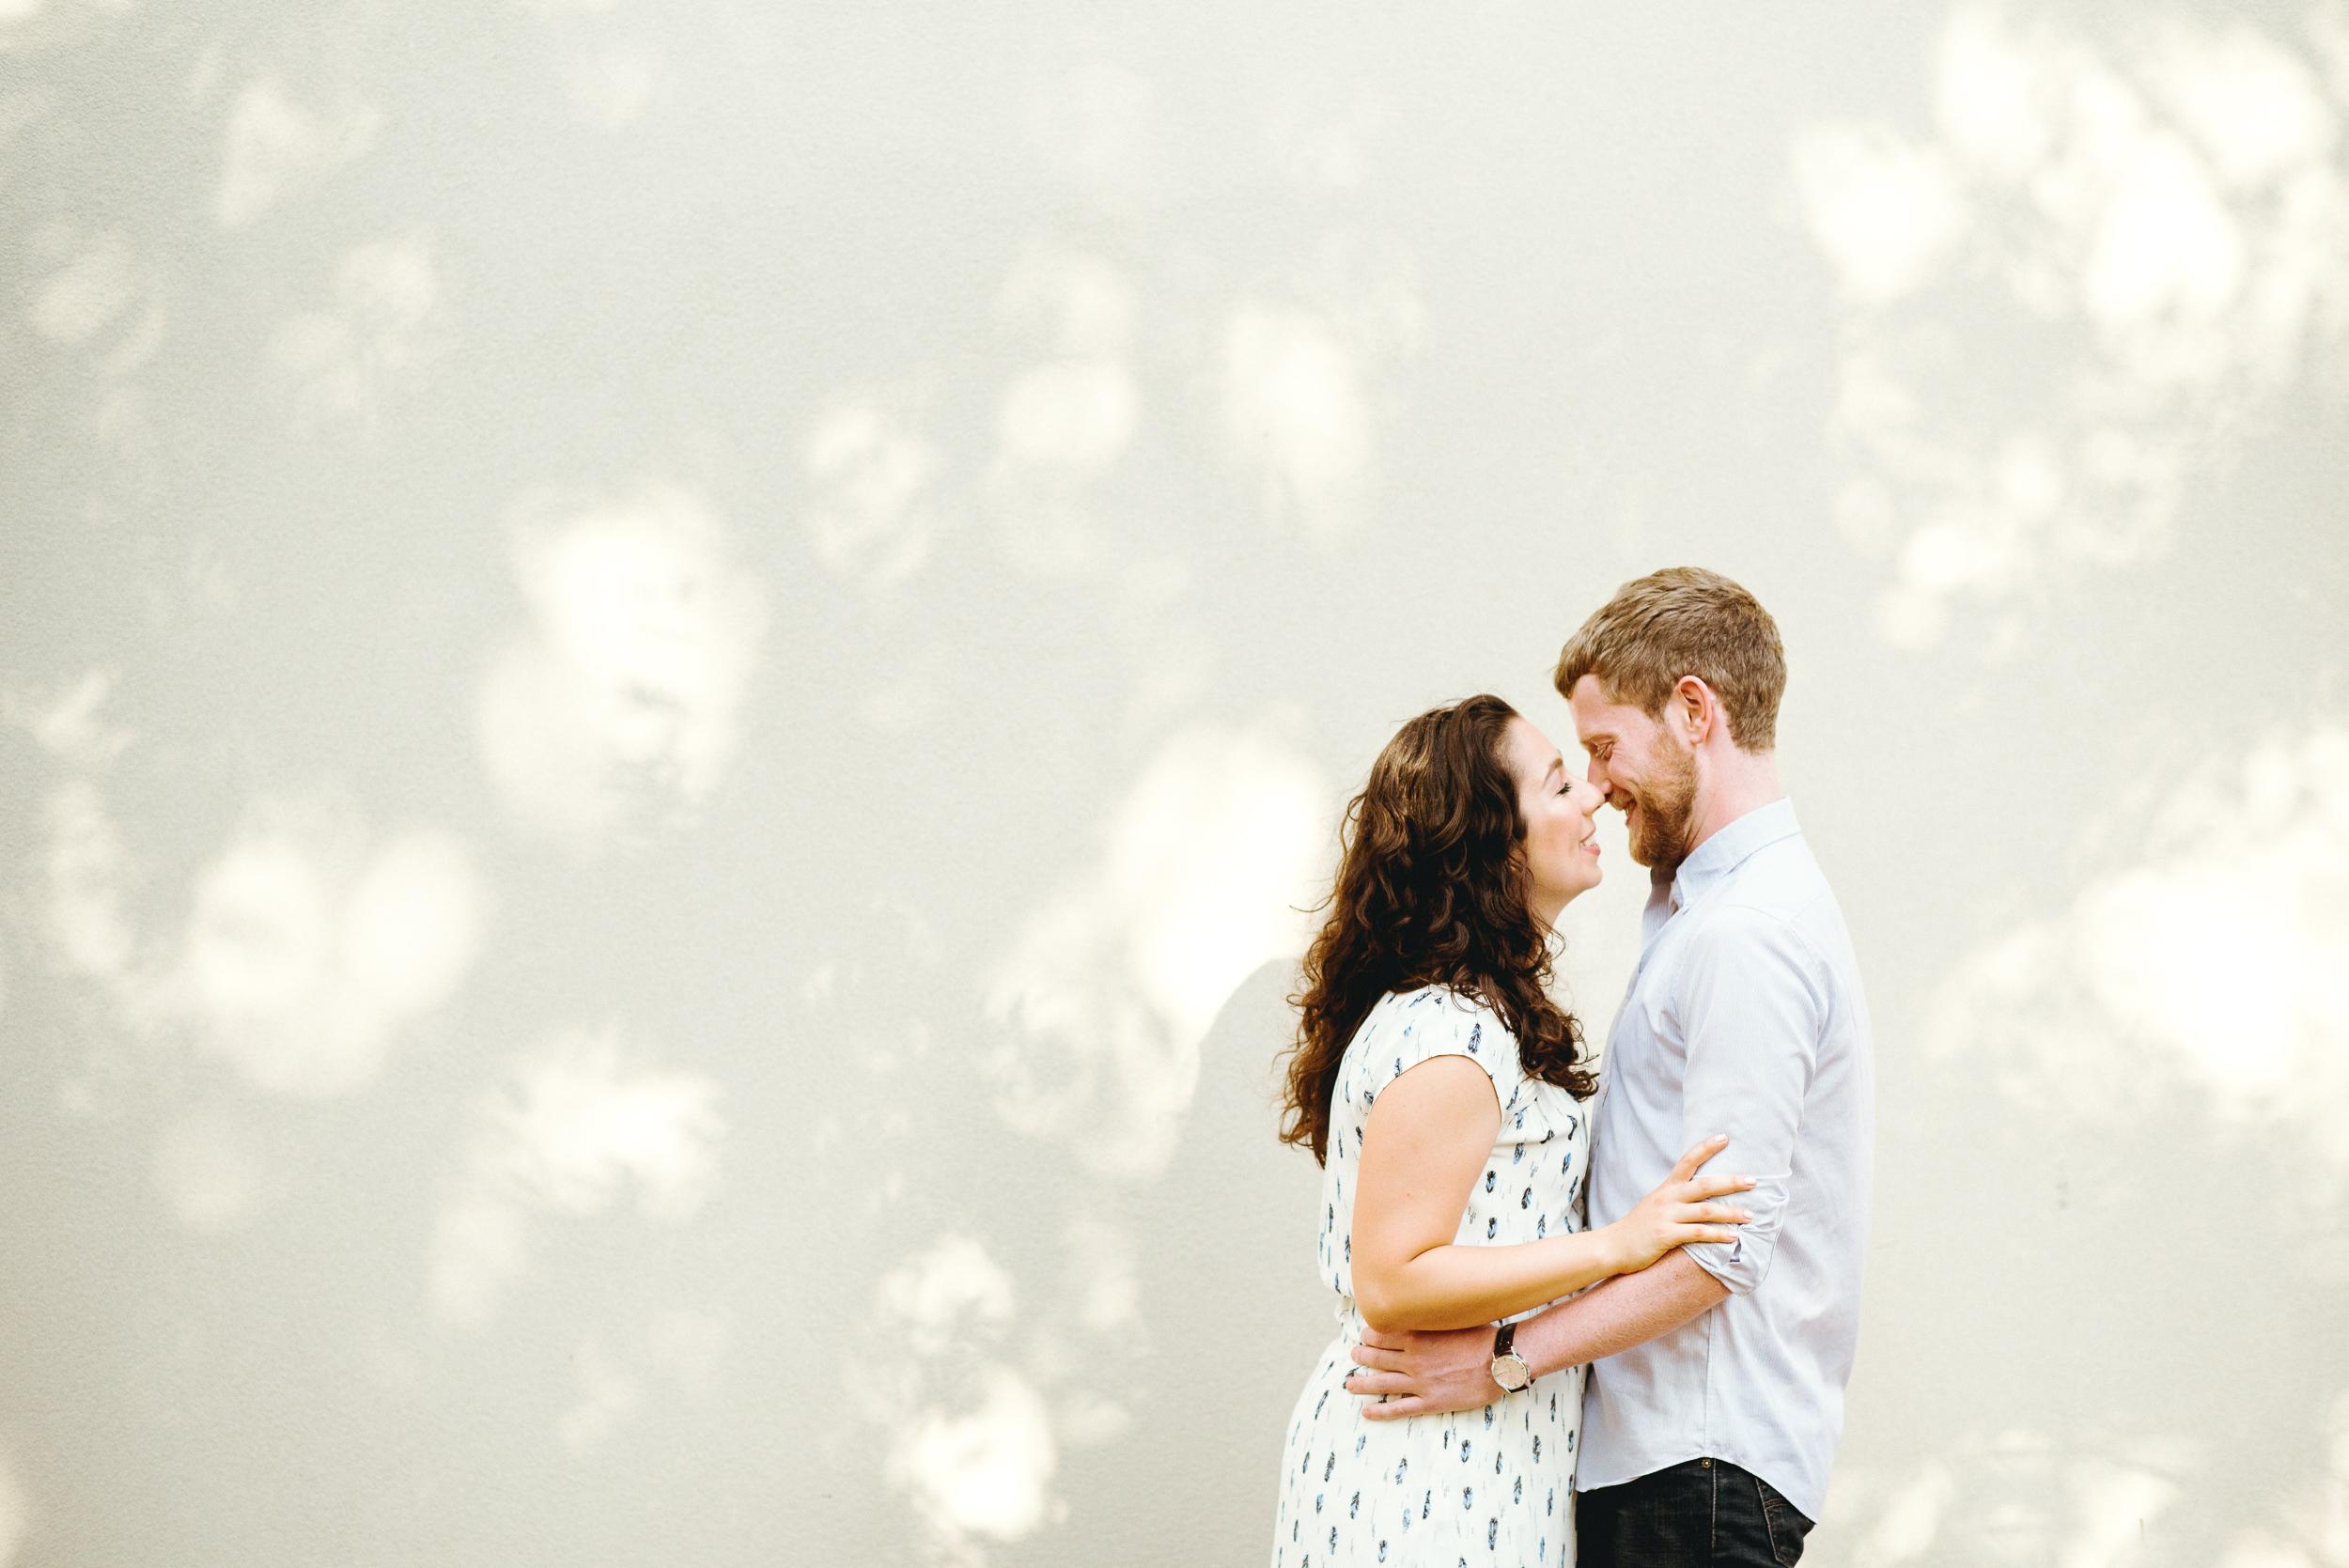 Philadelphia-engagement-photos-neon-mural-philadelphia-wedding-photographer-peaberry-photography-001.jpg